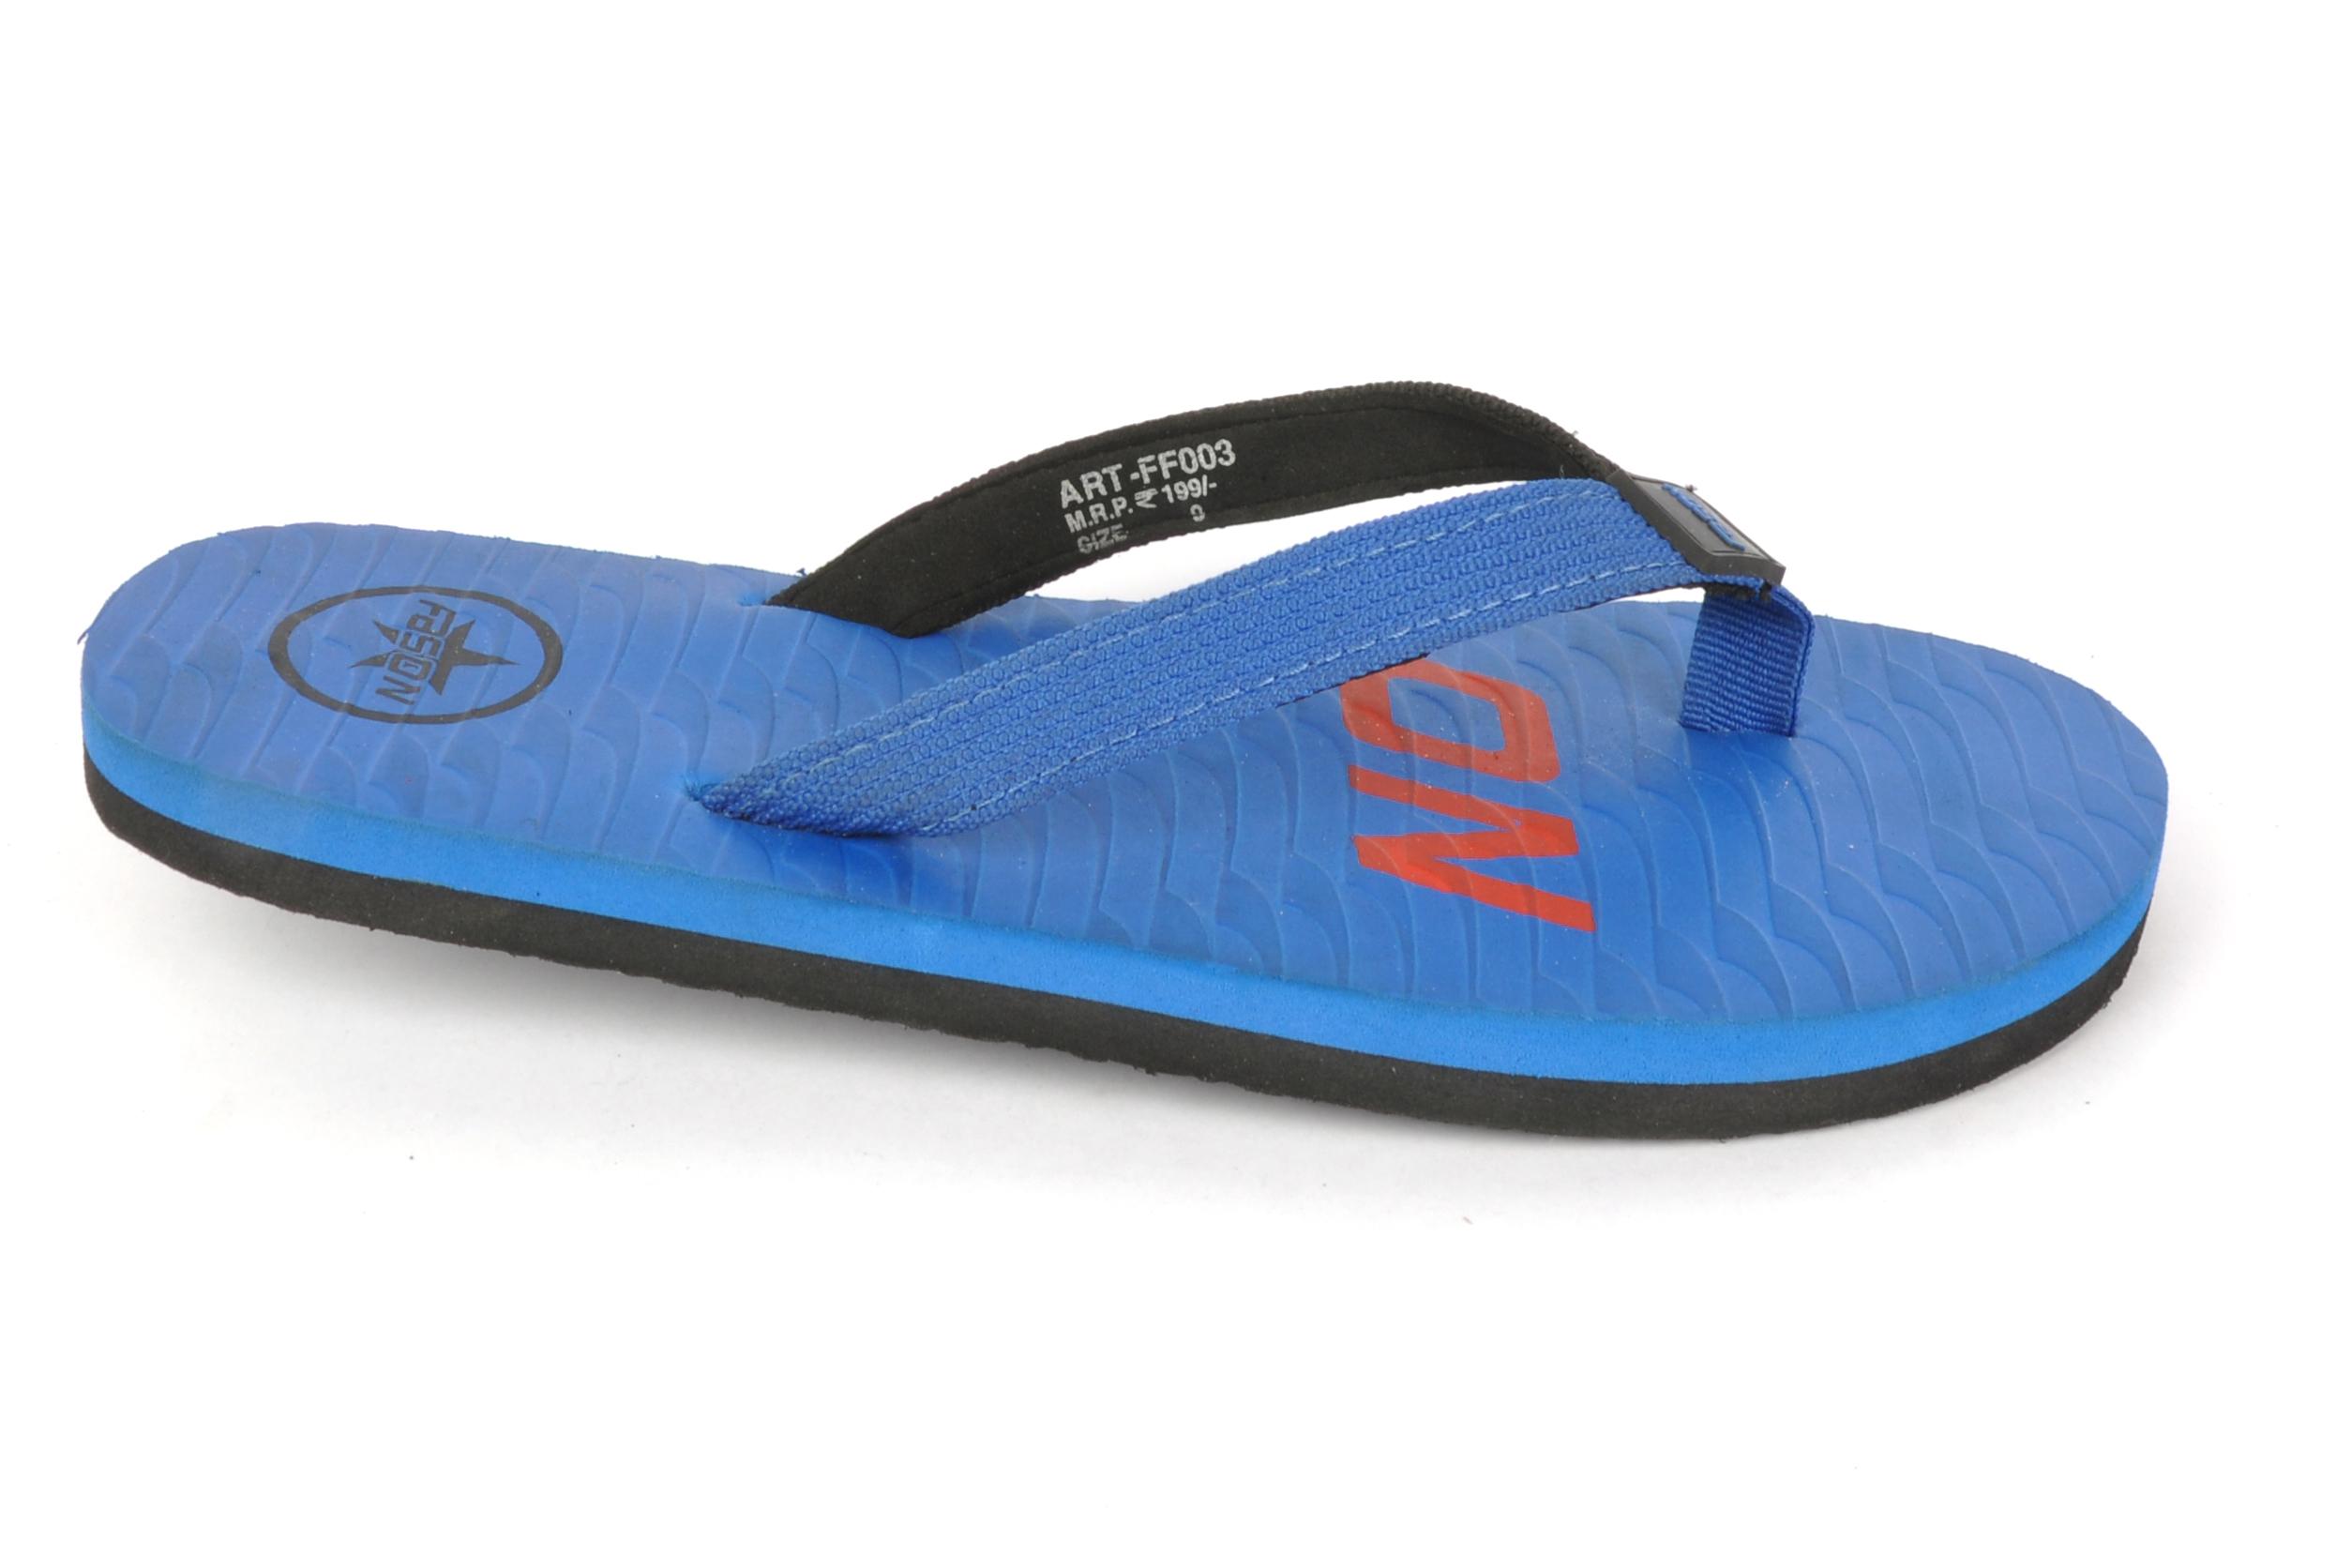 Blue Flip Flop Slipper